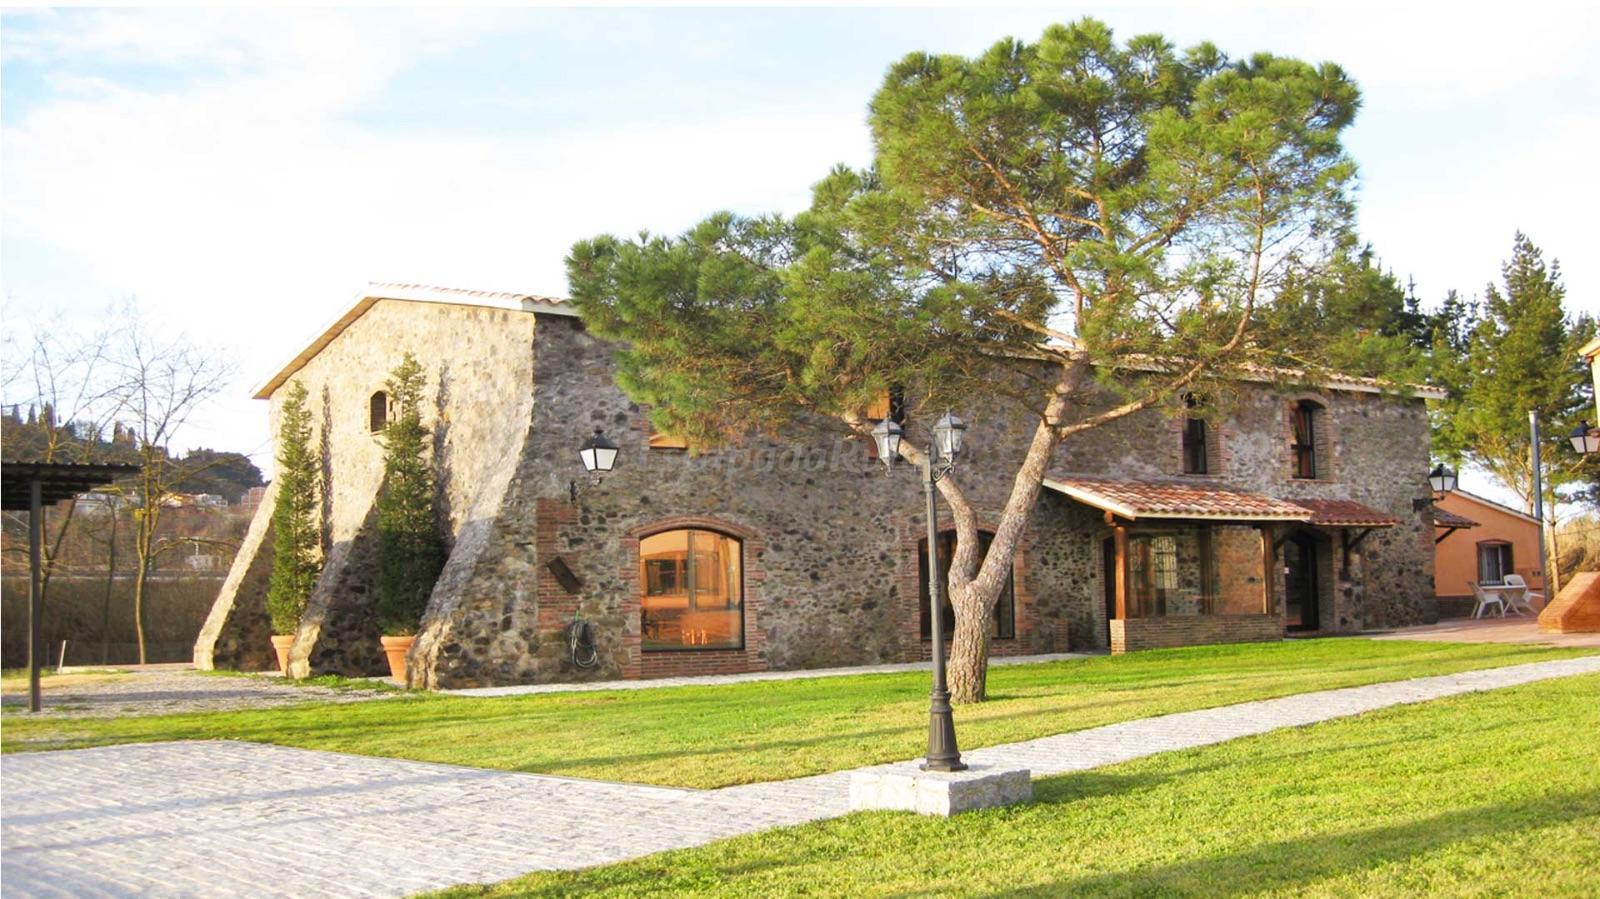 Fotos de mas caputxa casa rural en hostalric girona - Mas trobat casa rural ...